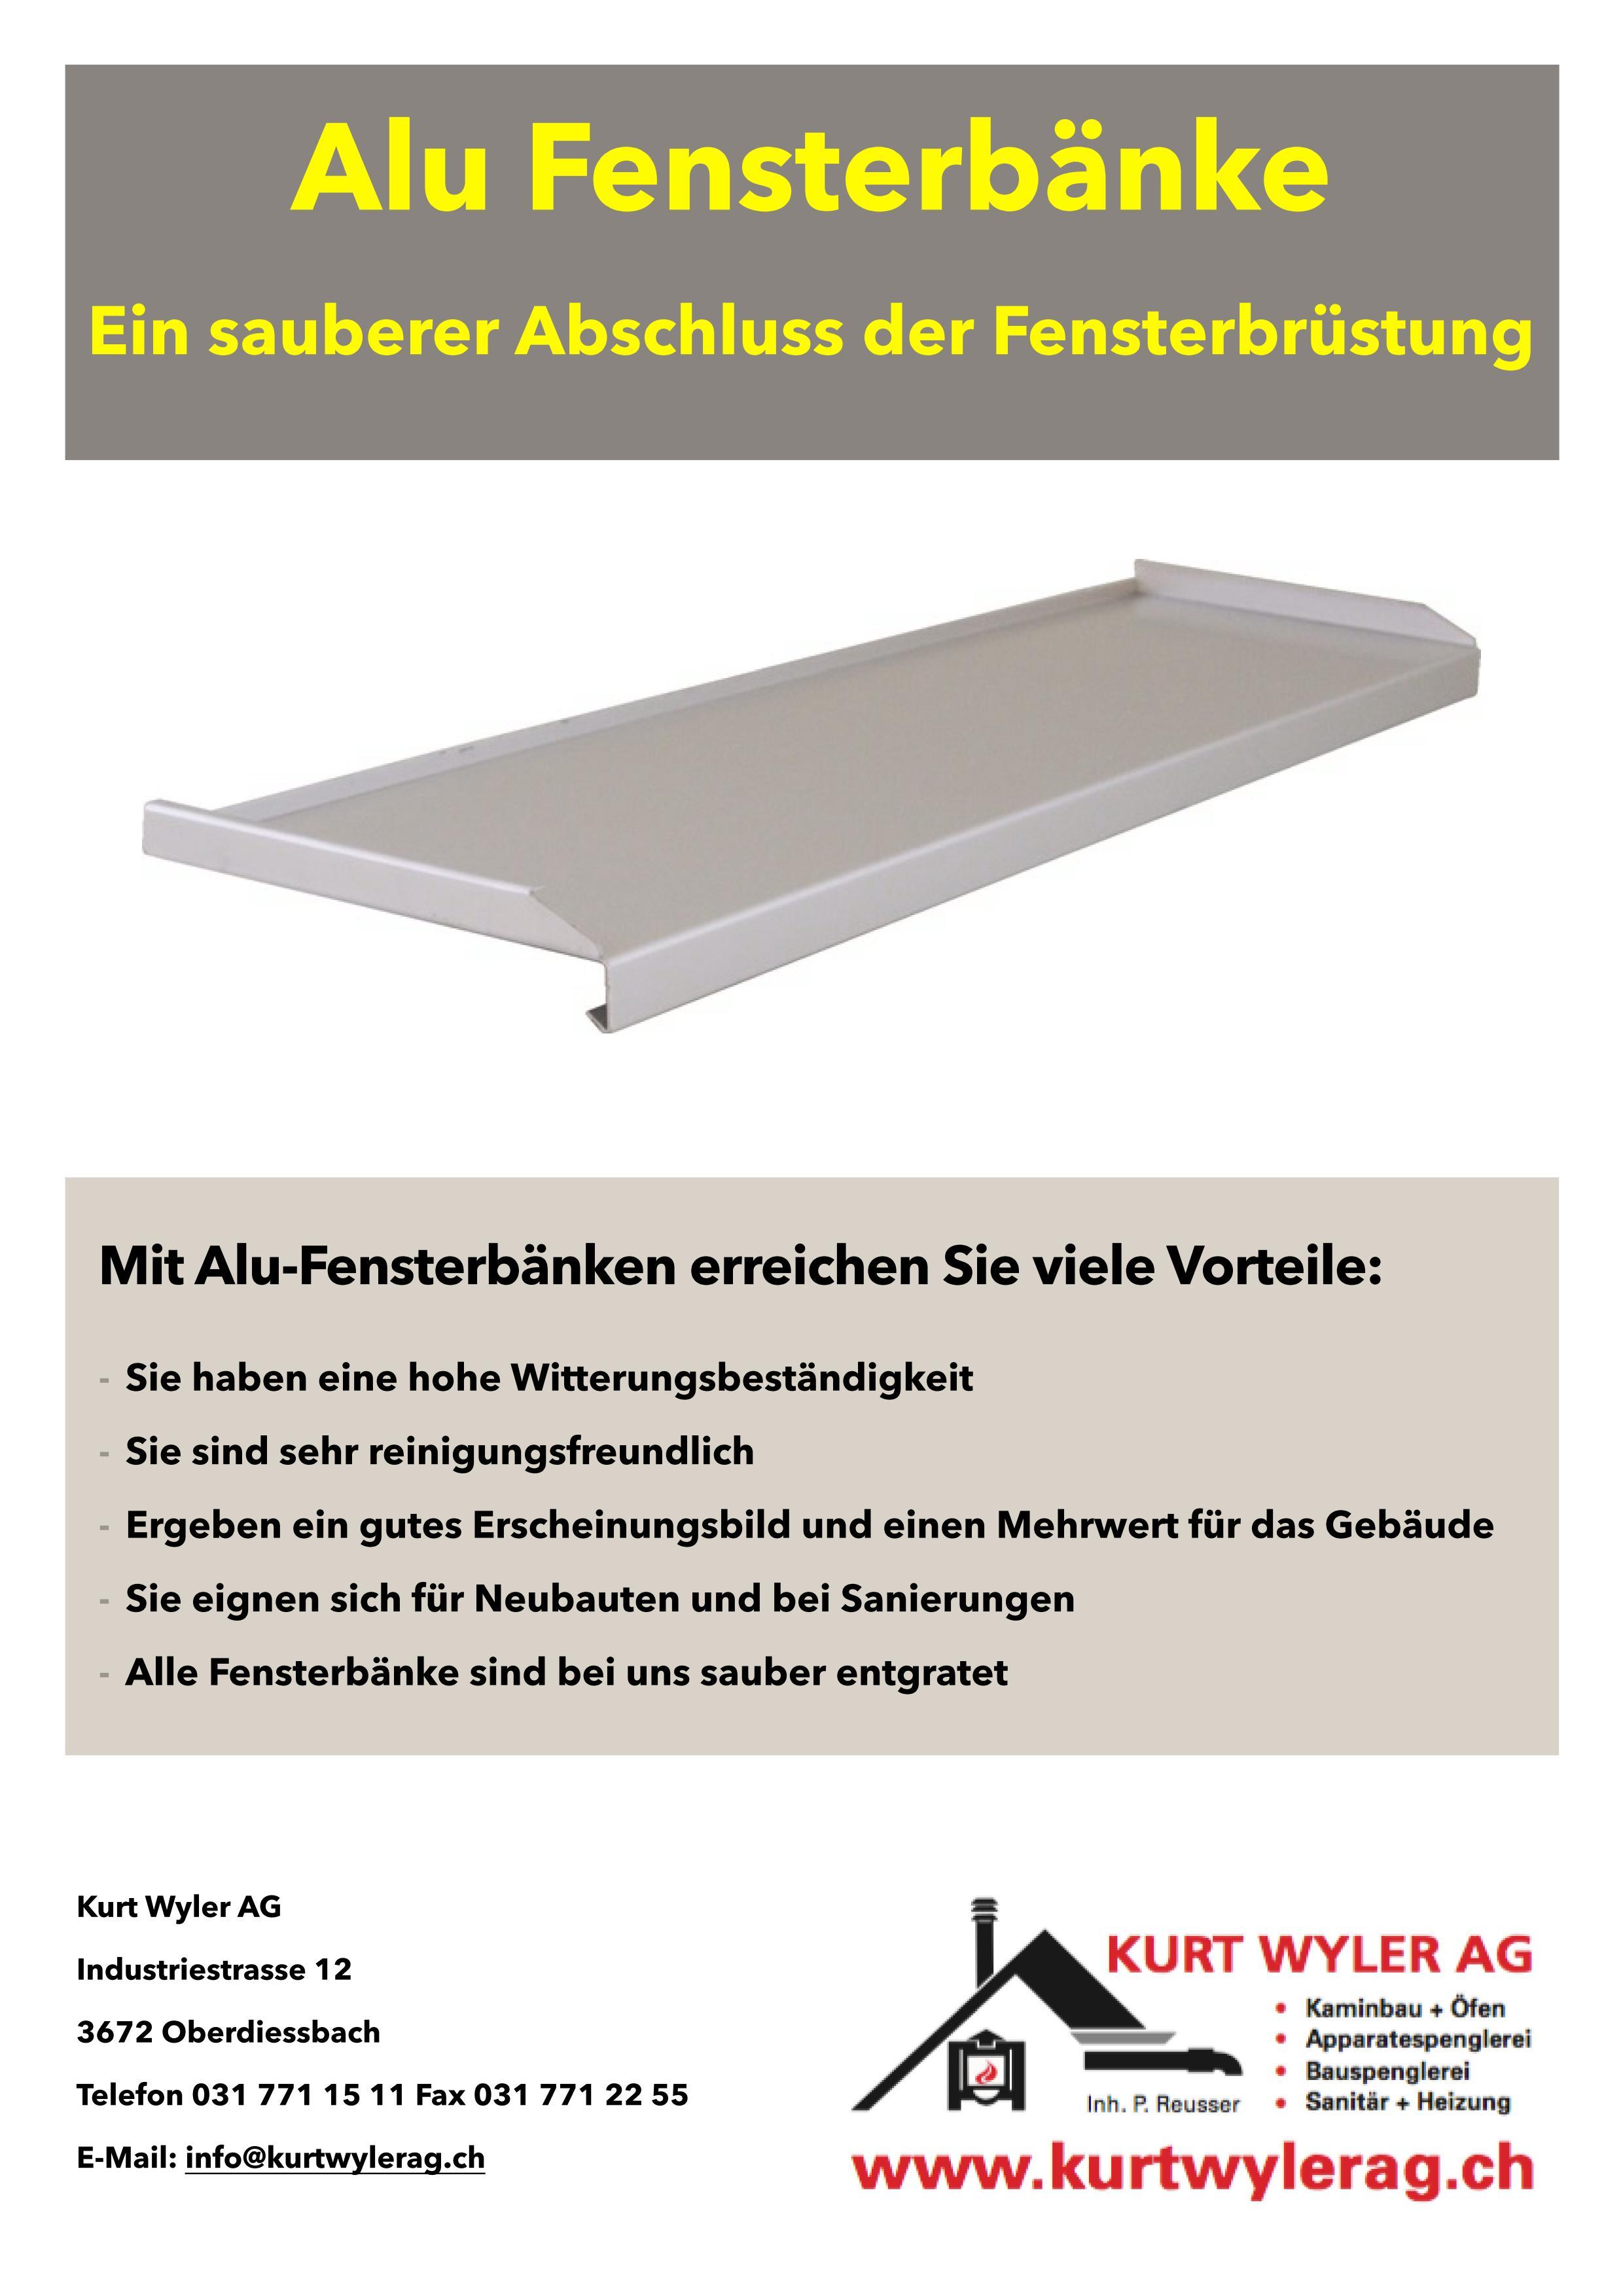 Fensterbänke aus Aluminium   Kurt Wyler AG - Kaminbau & Öfen ...